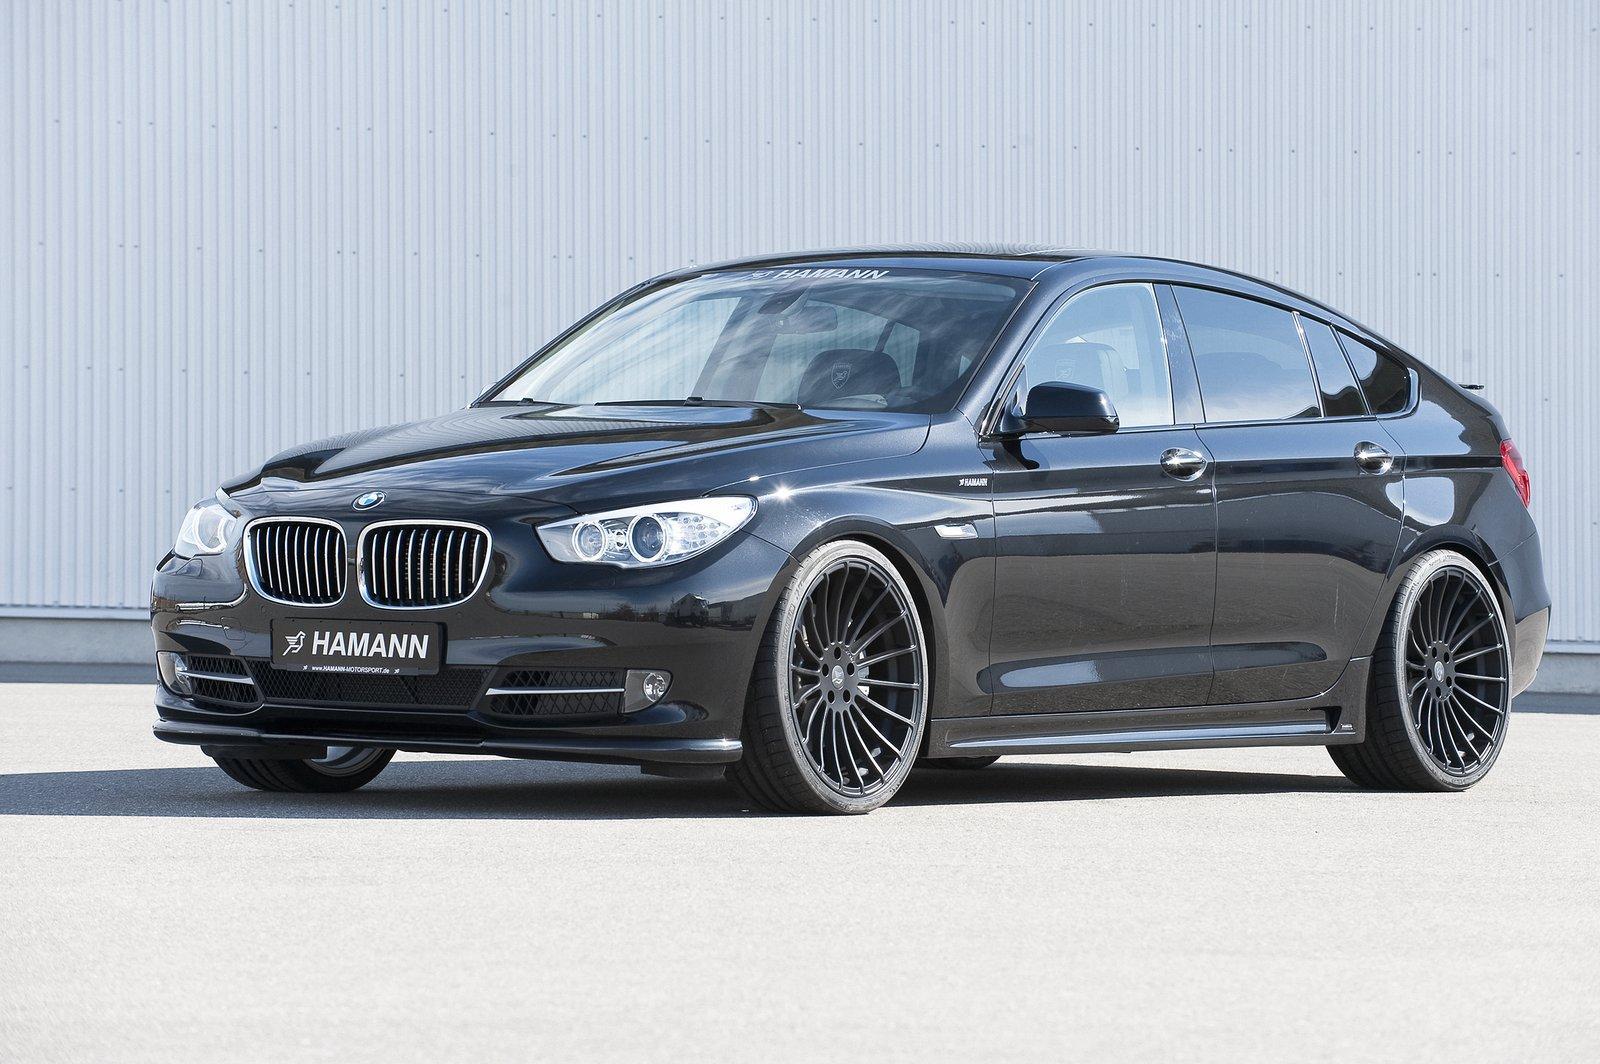 Hamann BMW Series GT Revealed - 2010 bmw 550i gt for sale